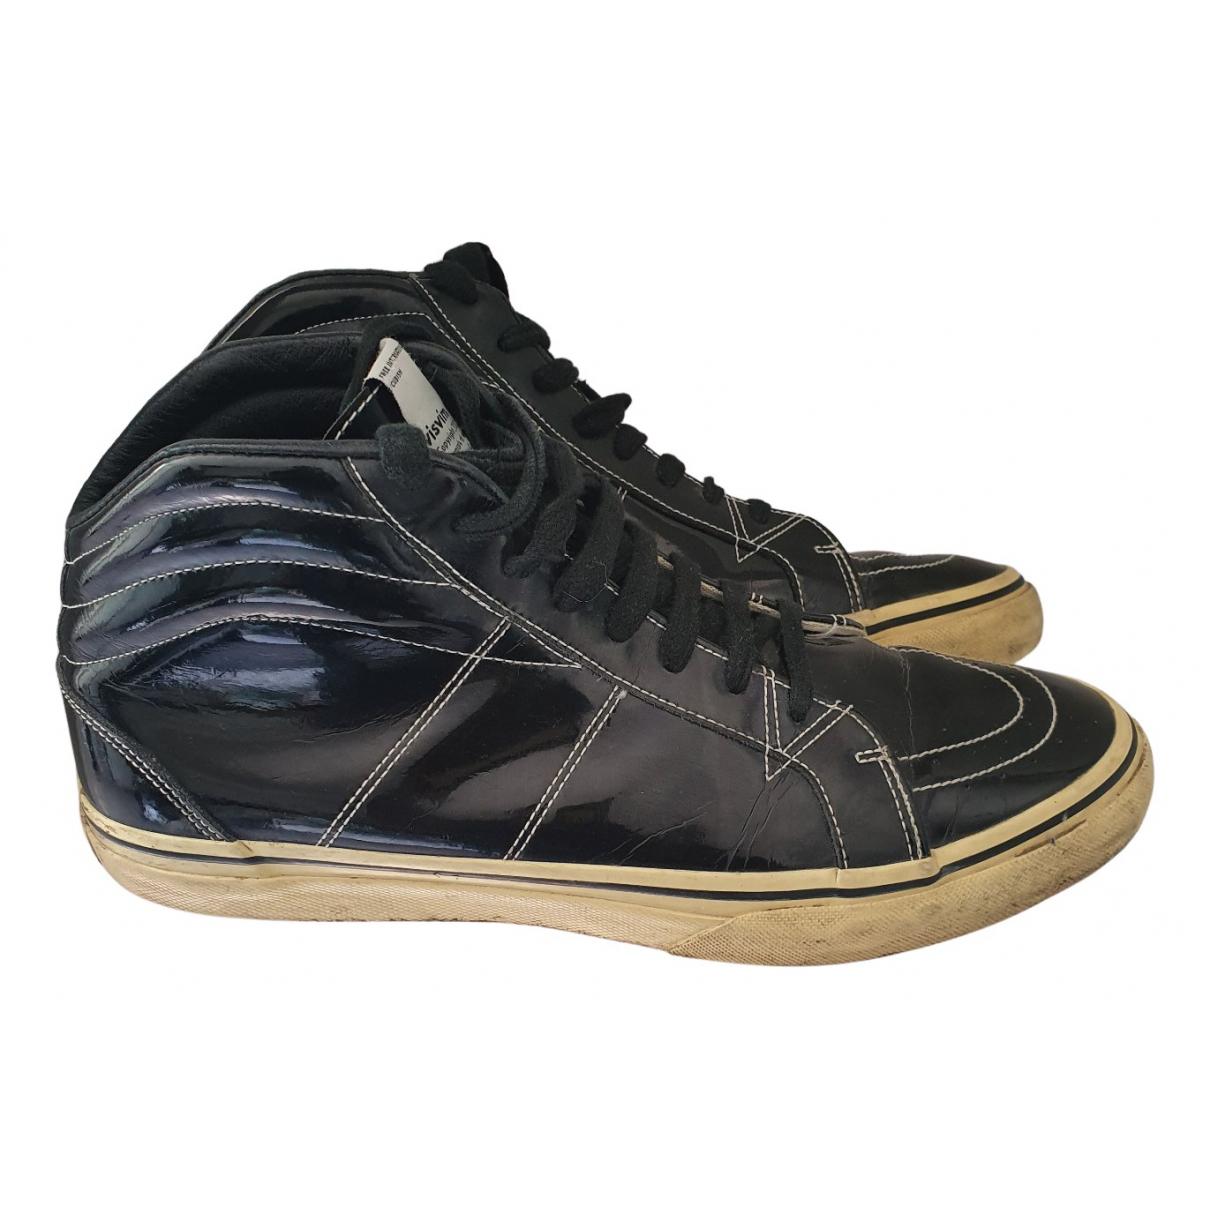 Visvim N Black Patent leather Trainers for Men 44 EU